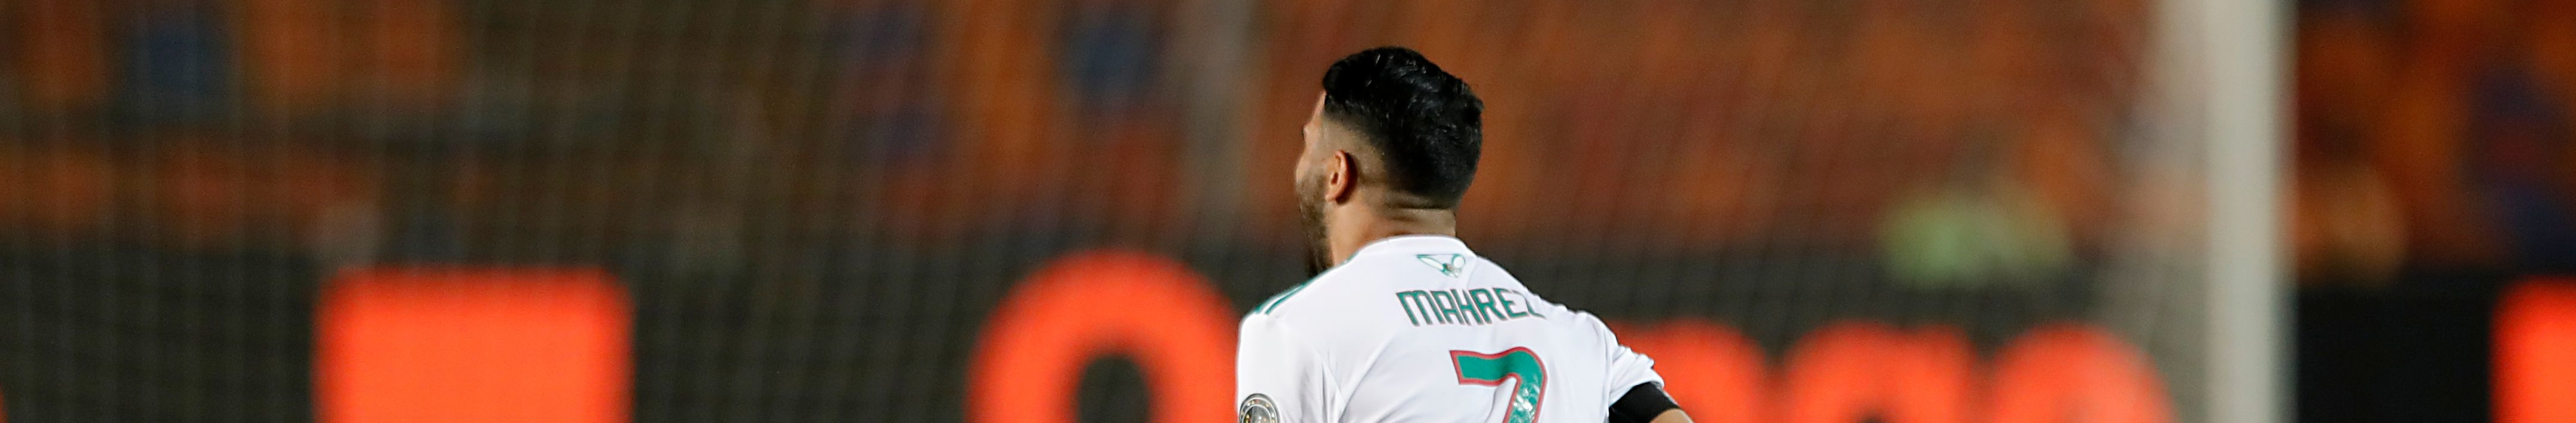 Senegal-Algeria, si assegna la Coppa d'Africa